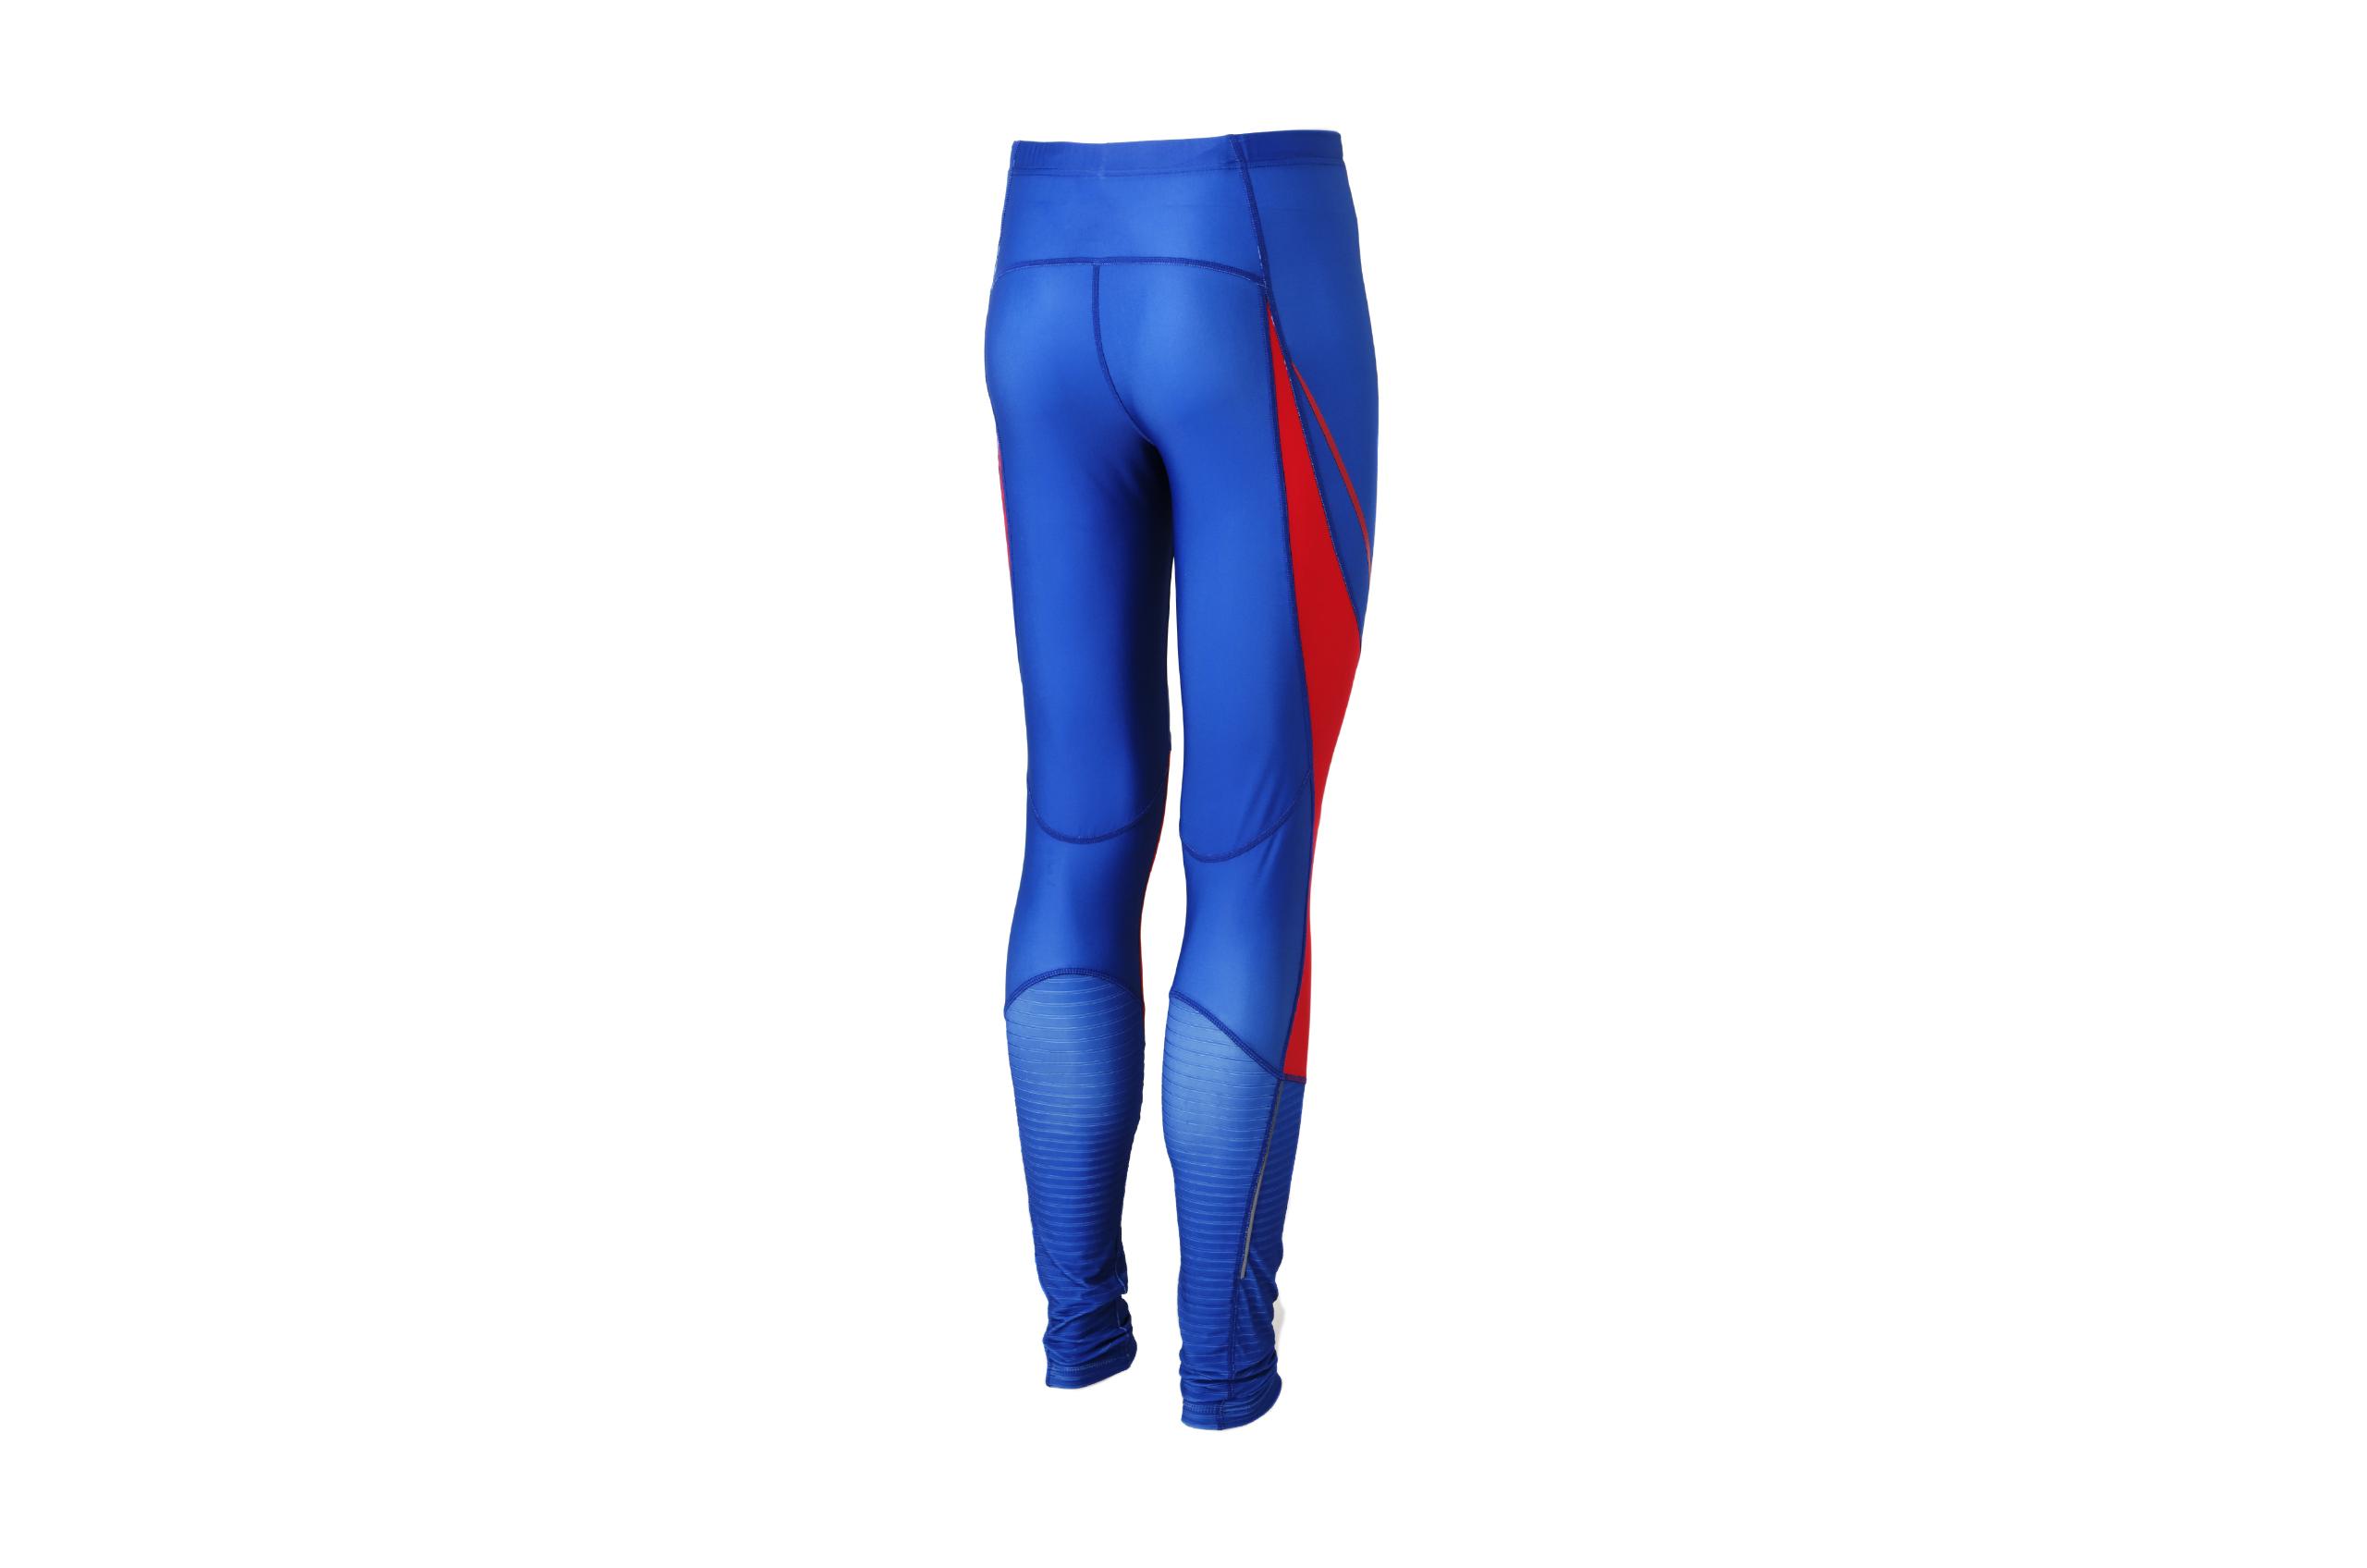 PREMIUM TWO PIECES SUIT UNISEX (red/blue)